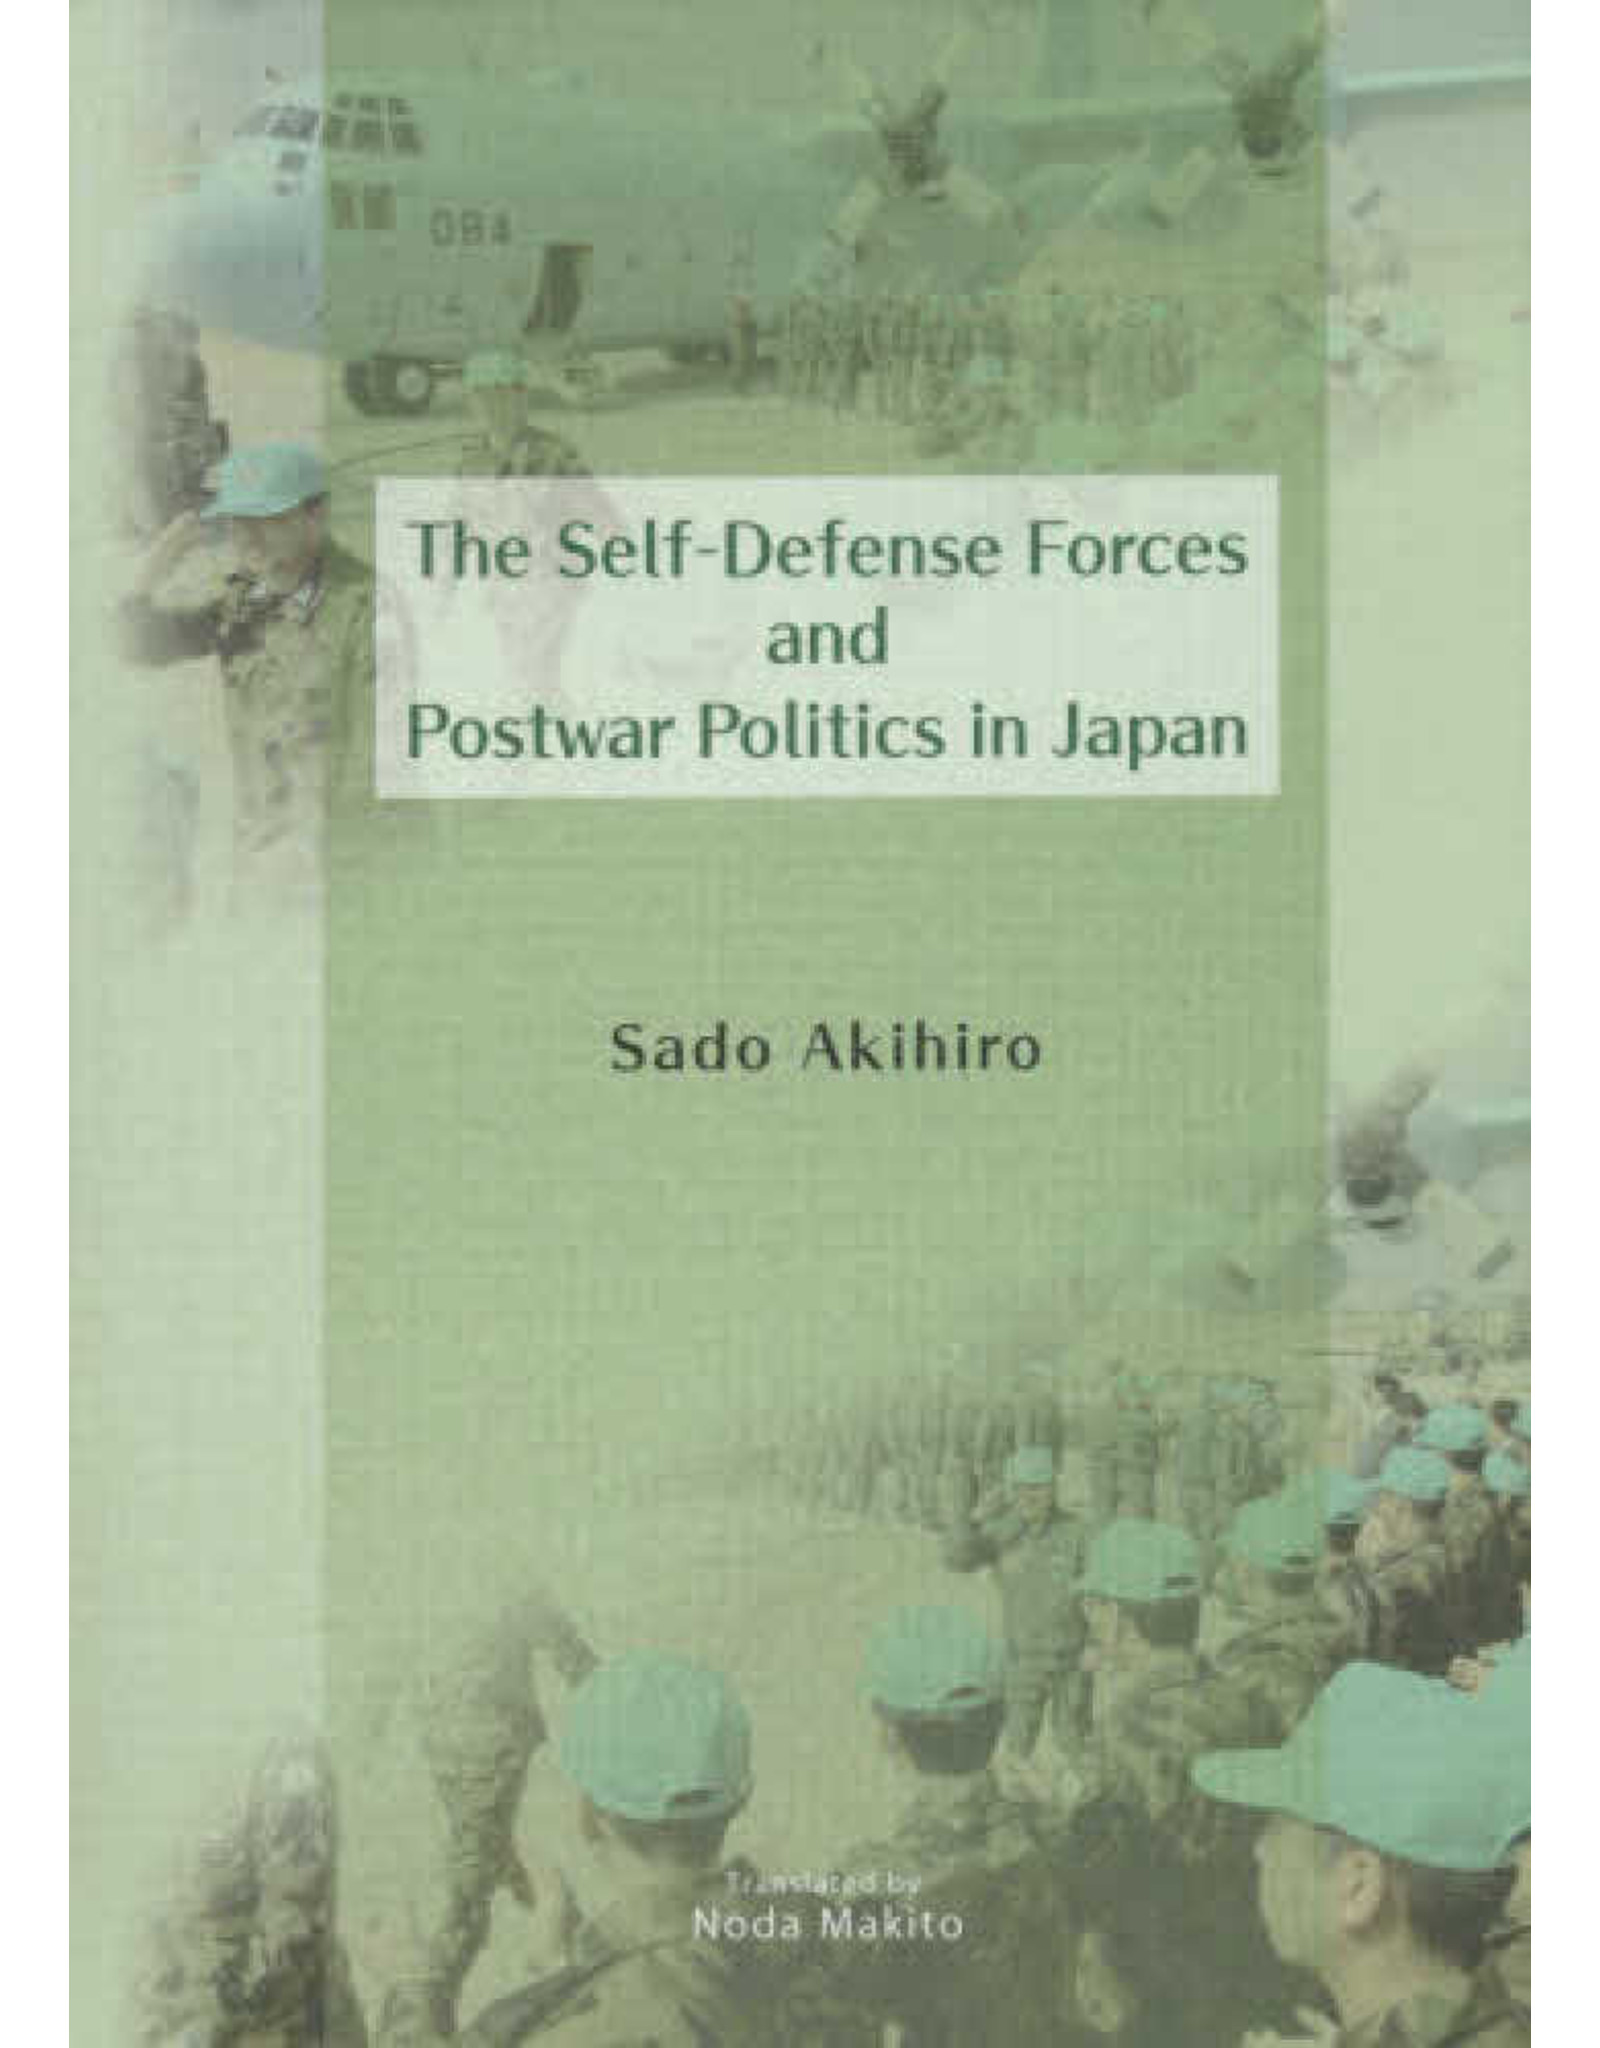 JPIC The Self-Defense Forces and Postwar Politics in Japan